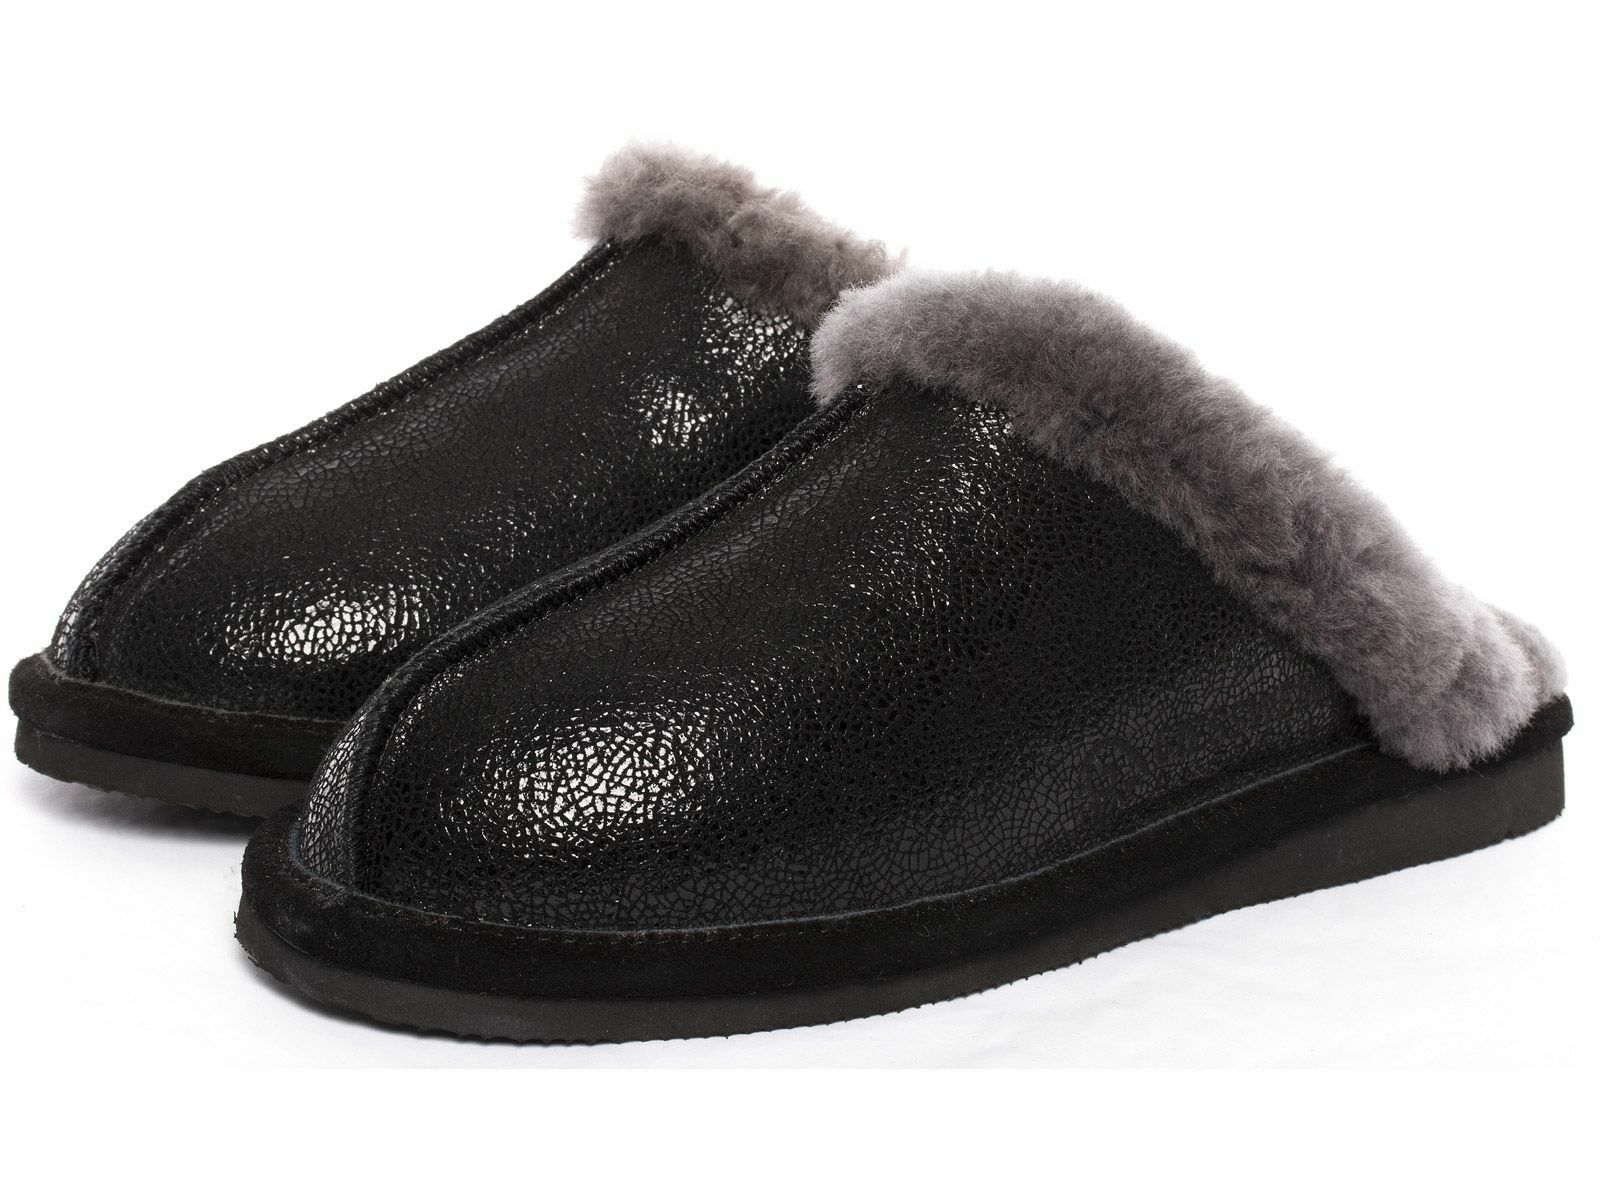 Giesswein Mering warme 42 Lammfell Pantoffeln Hausschuhe 36 - 42 warme Slipper schwarz dddf6f